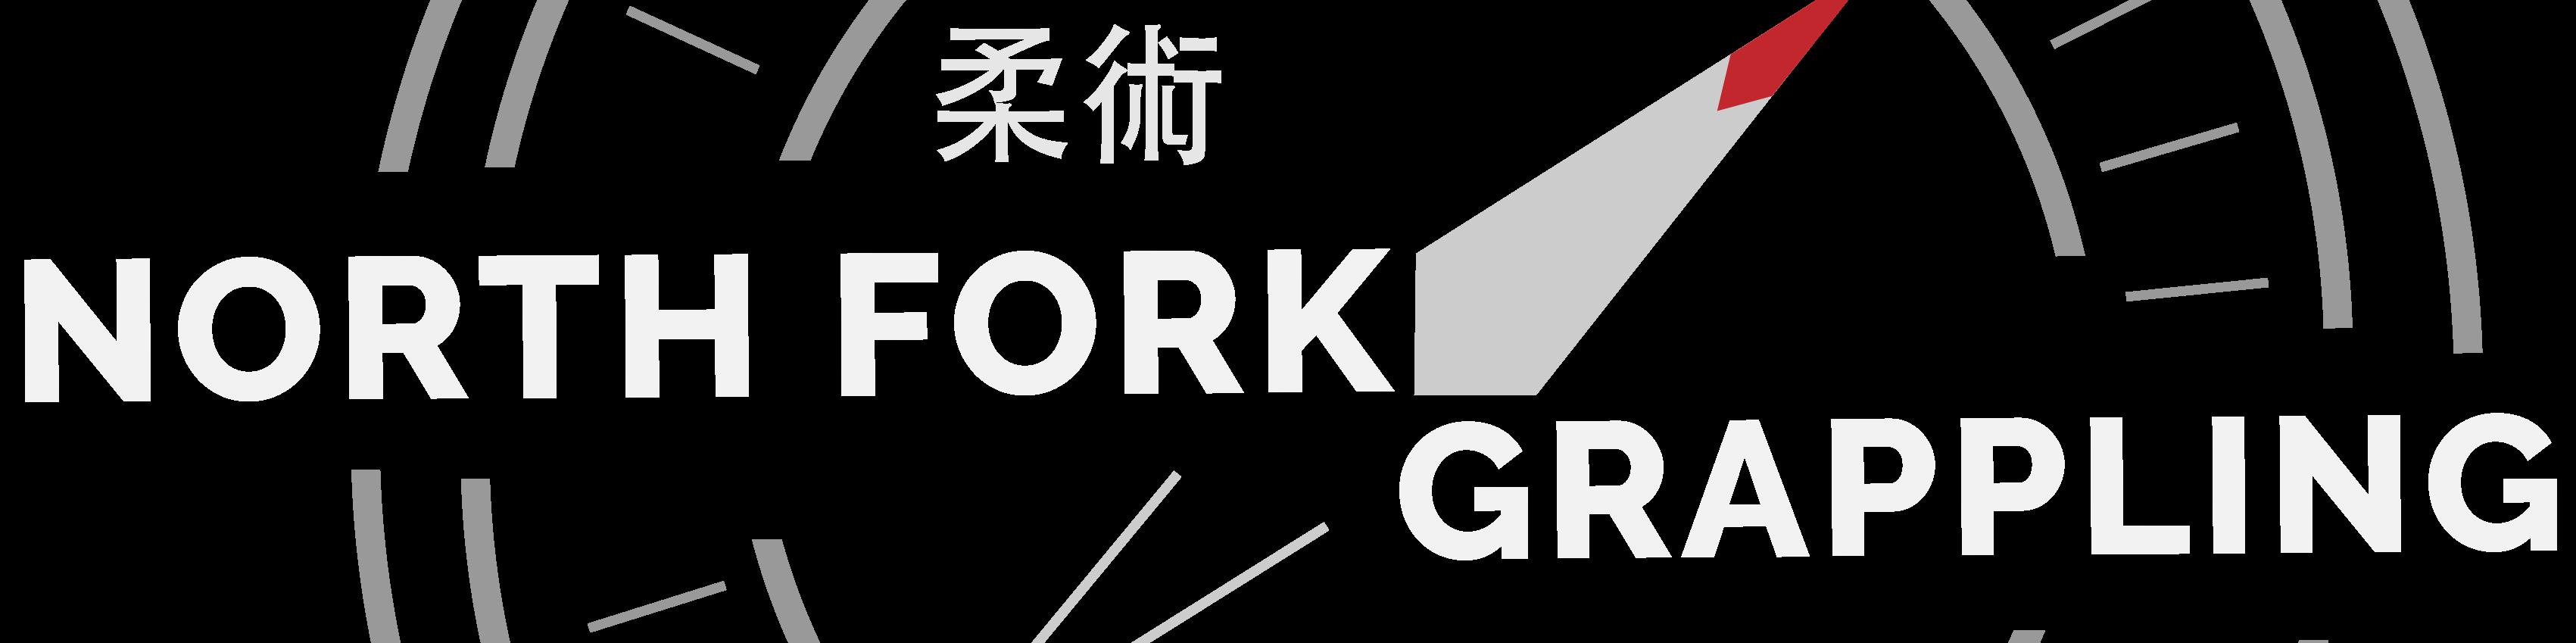 North Fork Grappling